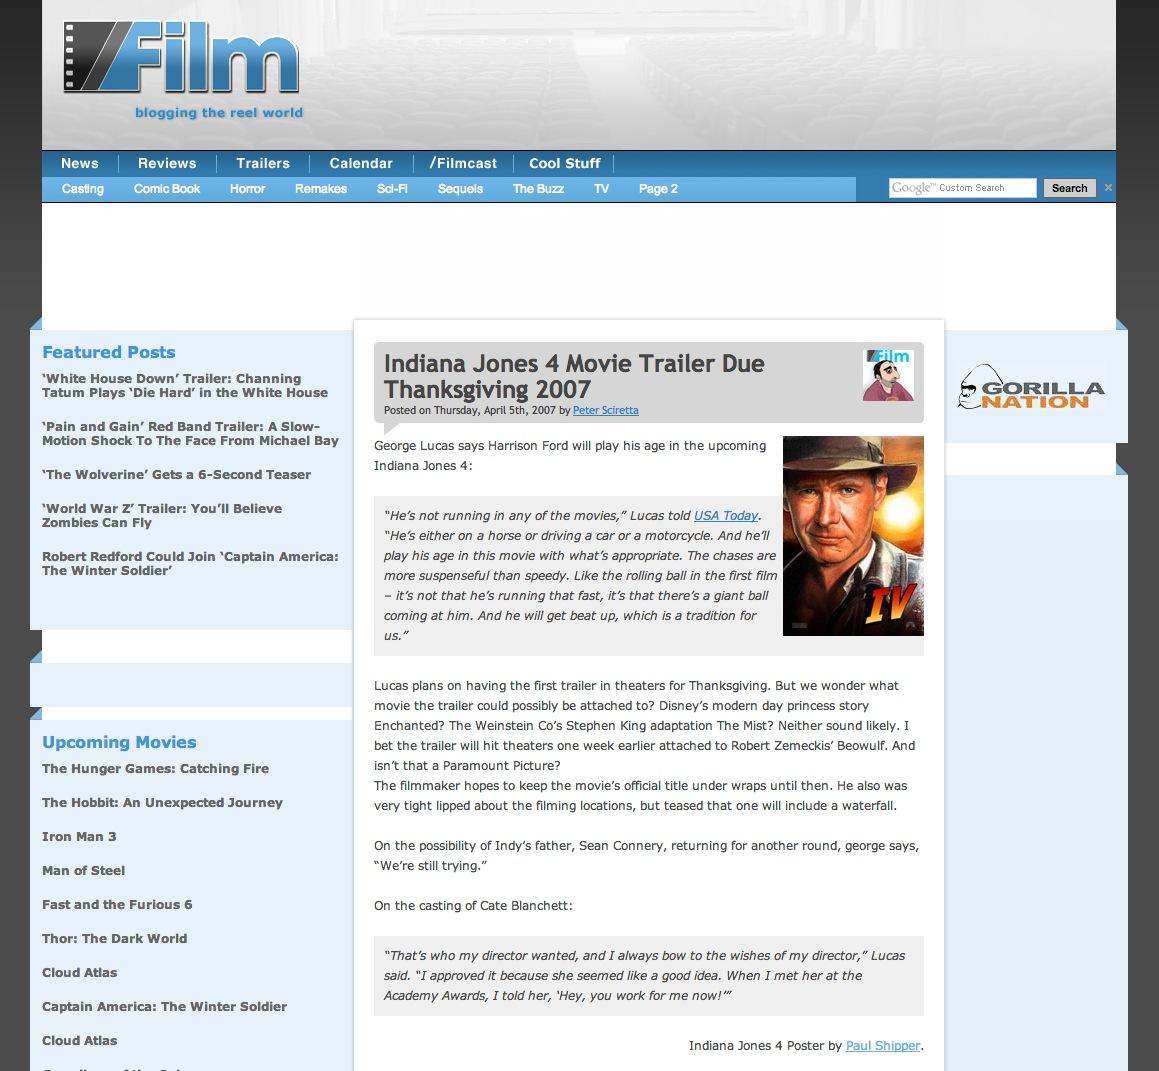 Indiana Jones 4 - Slash Film